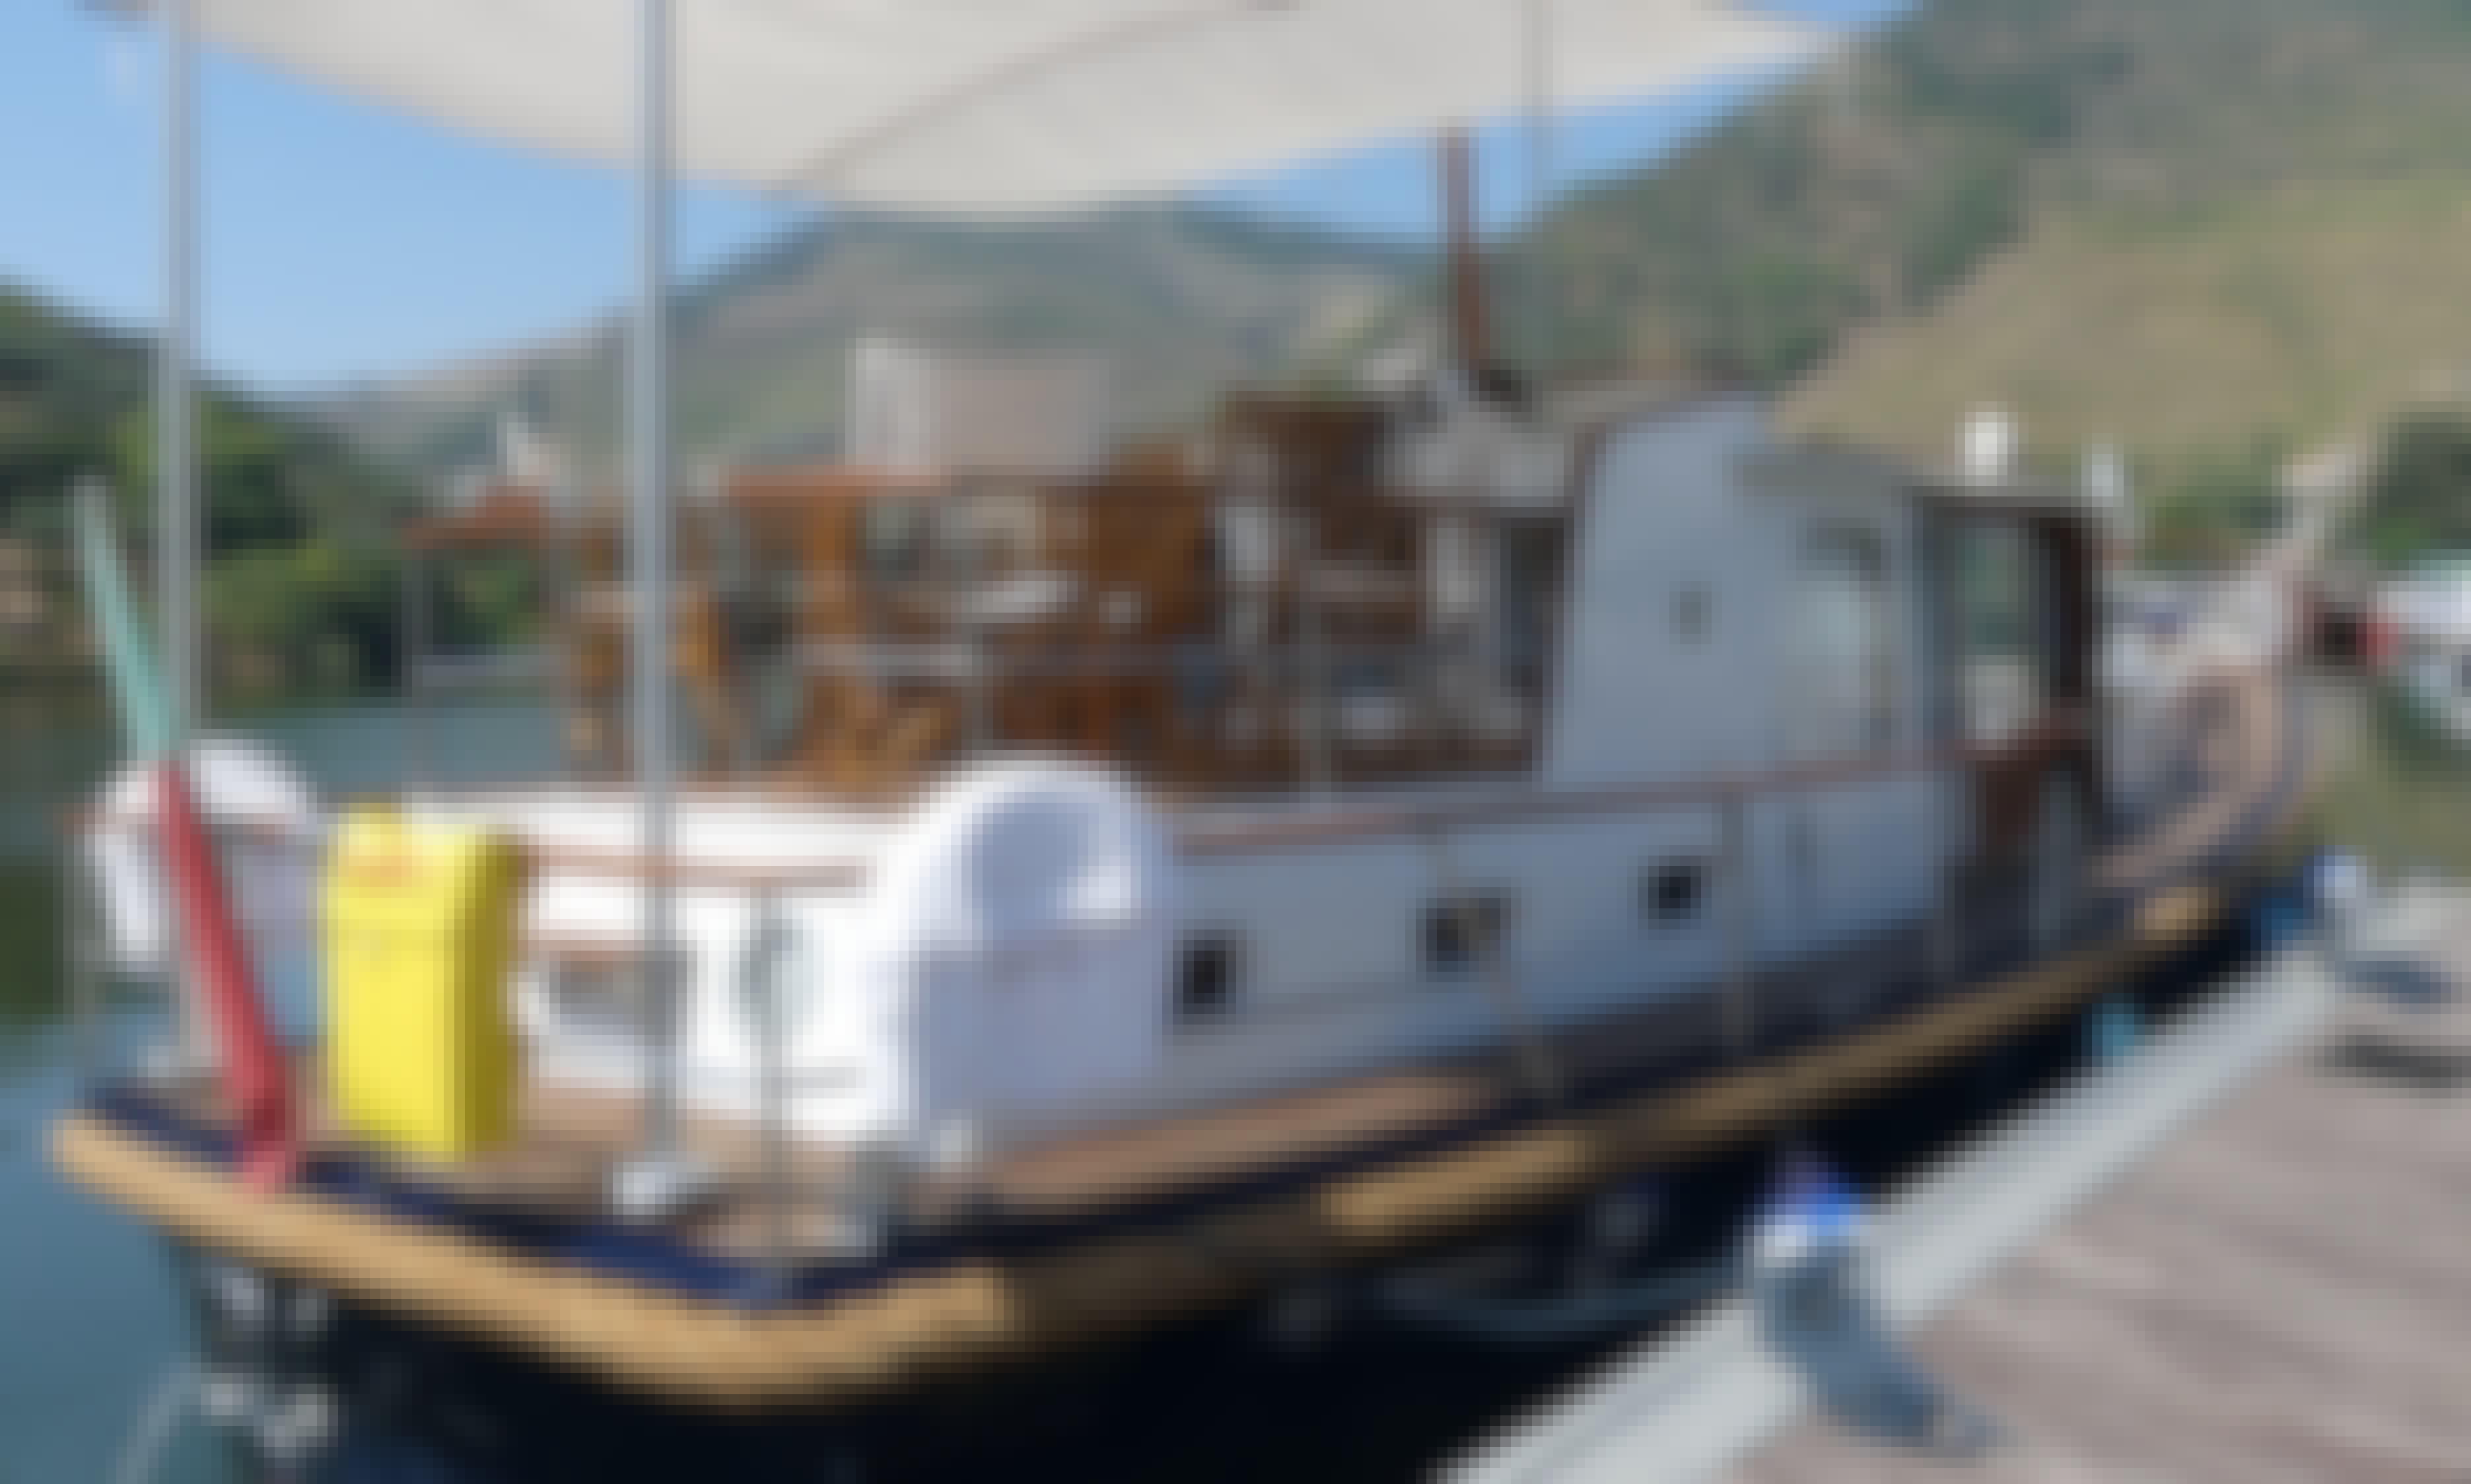 Valk Gentleman's Motor Yacht 40' Tour in Pinhão, Portugal